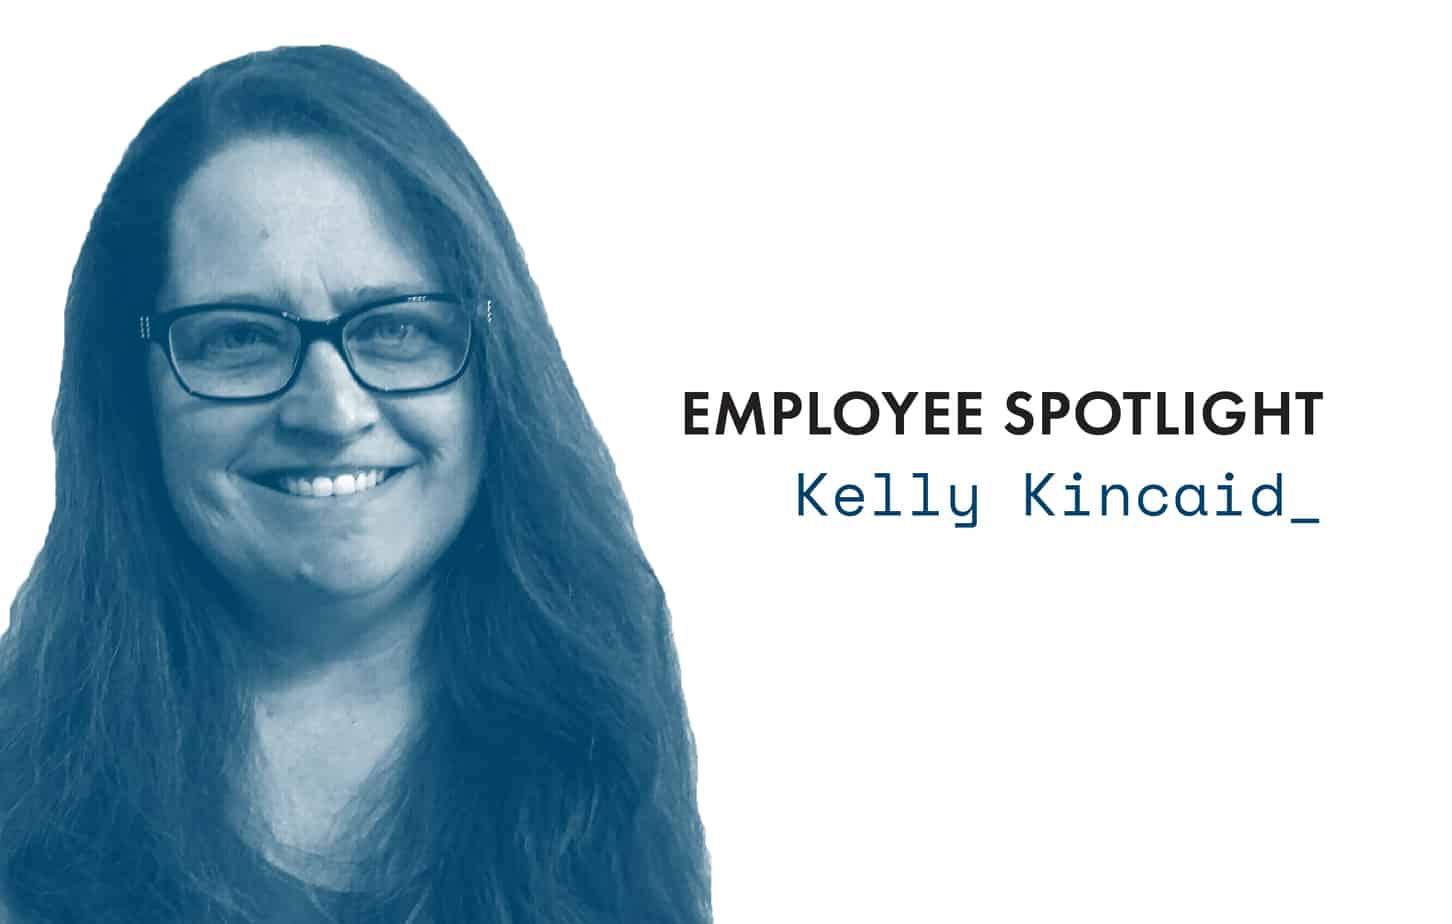 Employee Spotlight | Kelly Kincaid